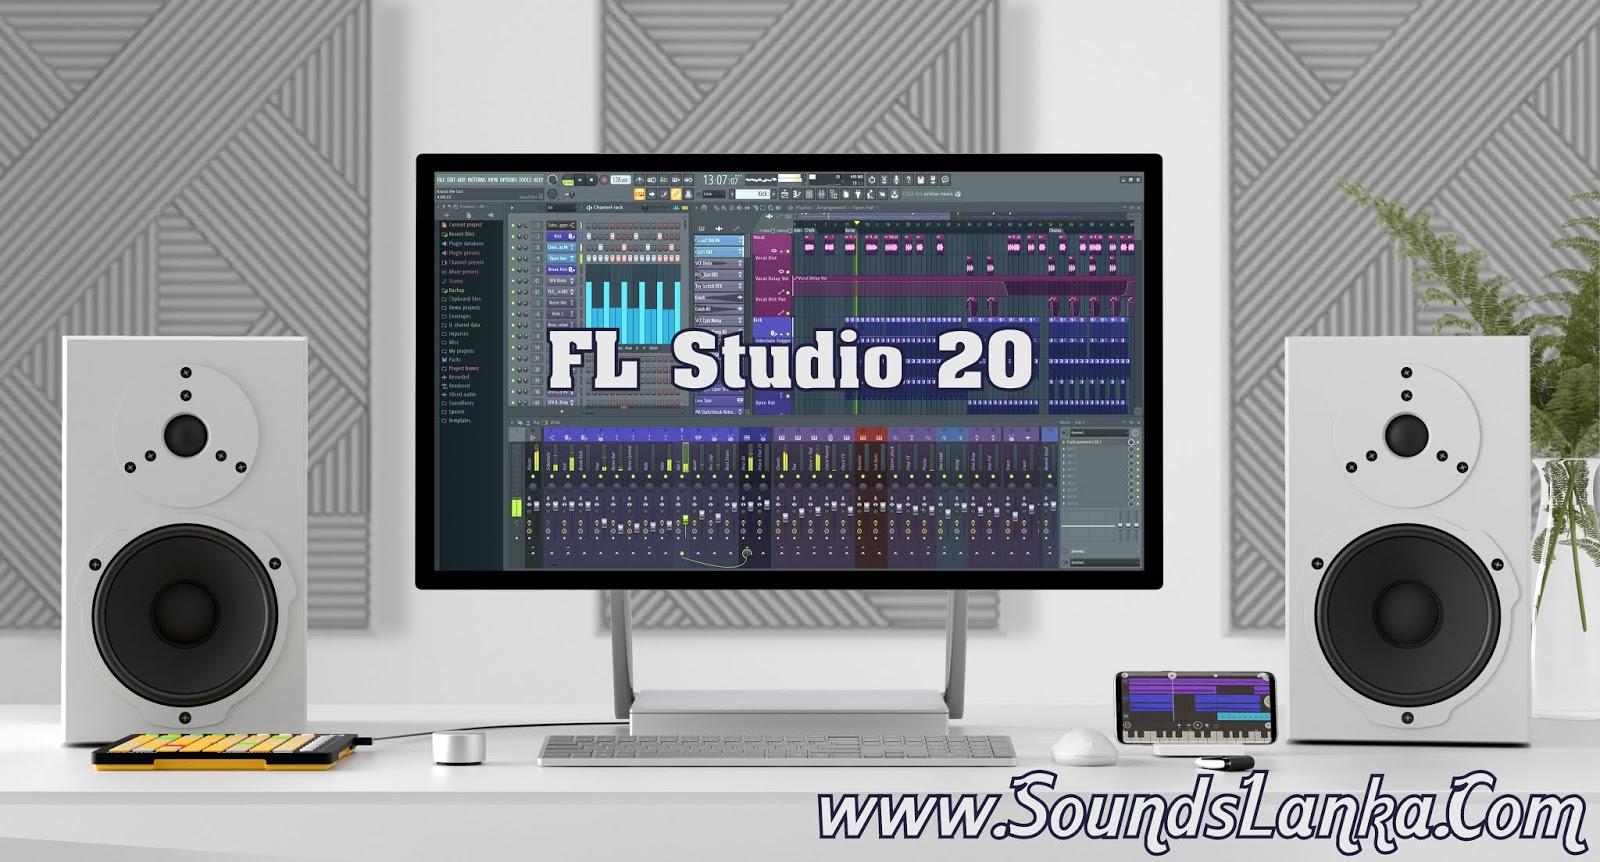 fl studio 12.5 r2r keygen download